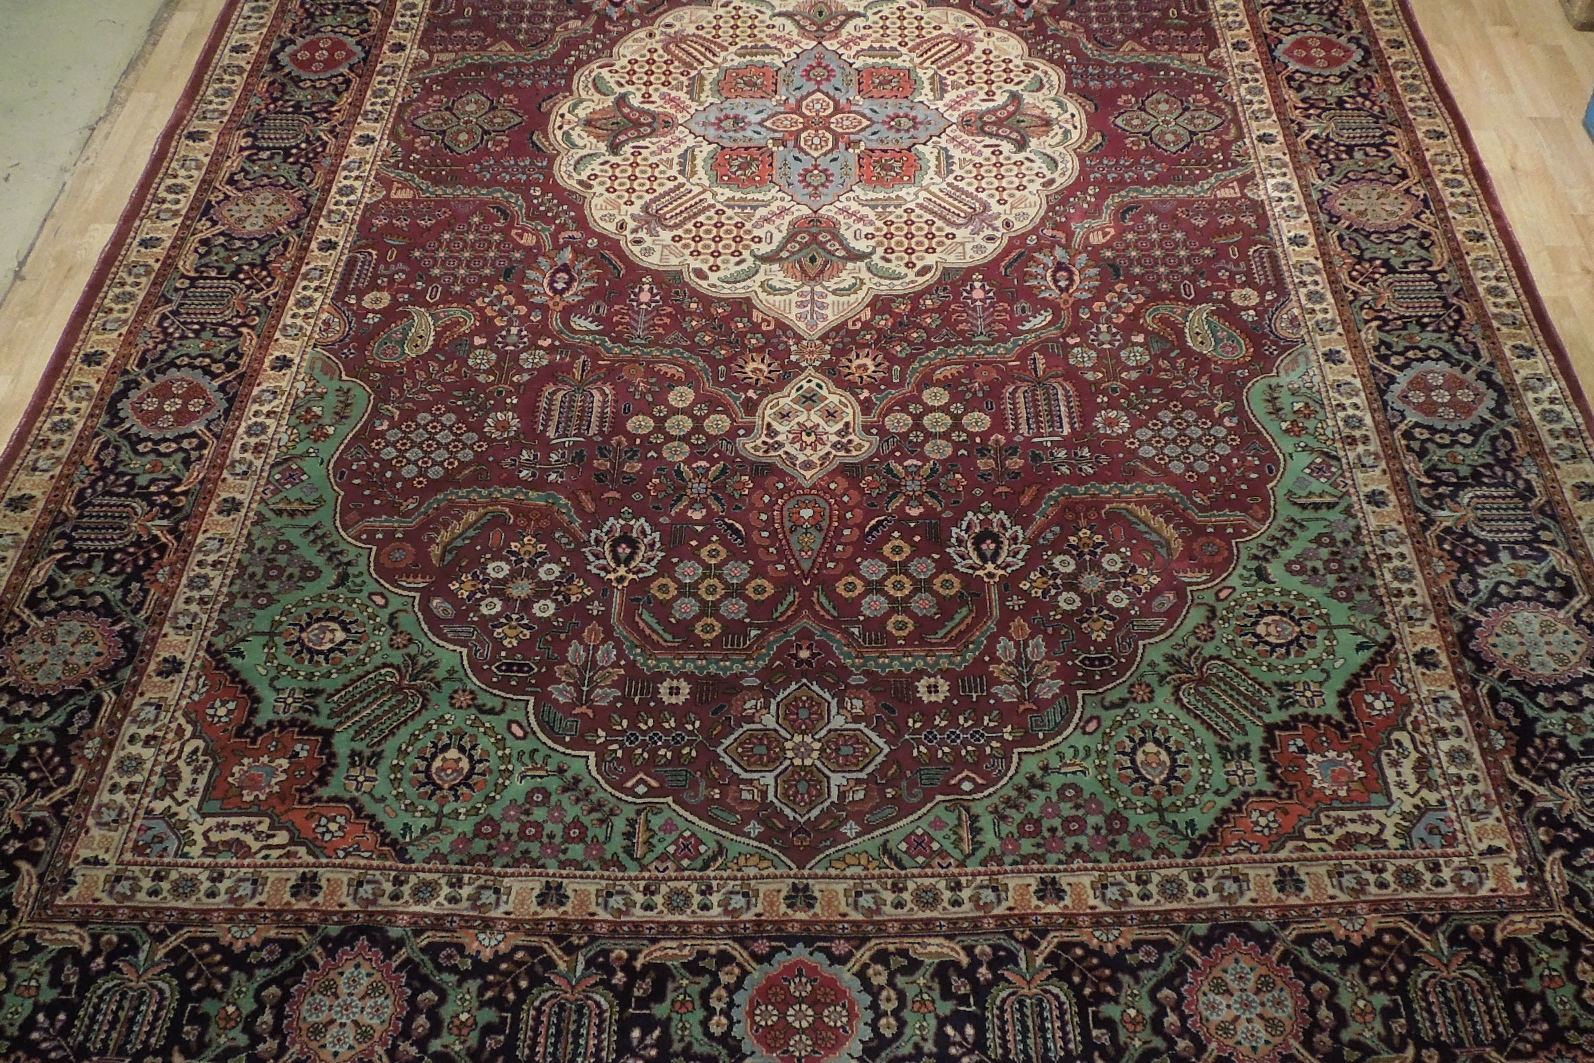 Compex Design Original Red Traditional Persian Wool Handmade Rug 10x16 Rug image 12